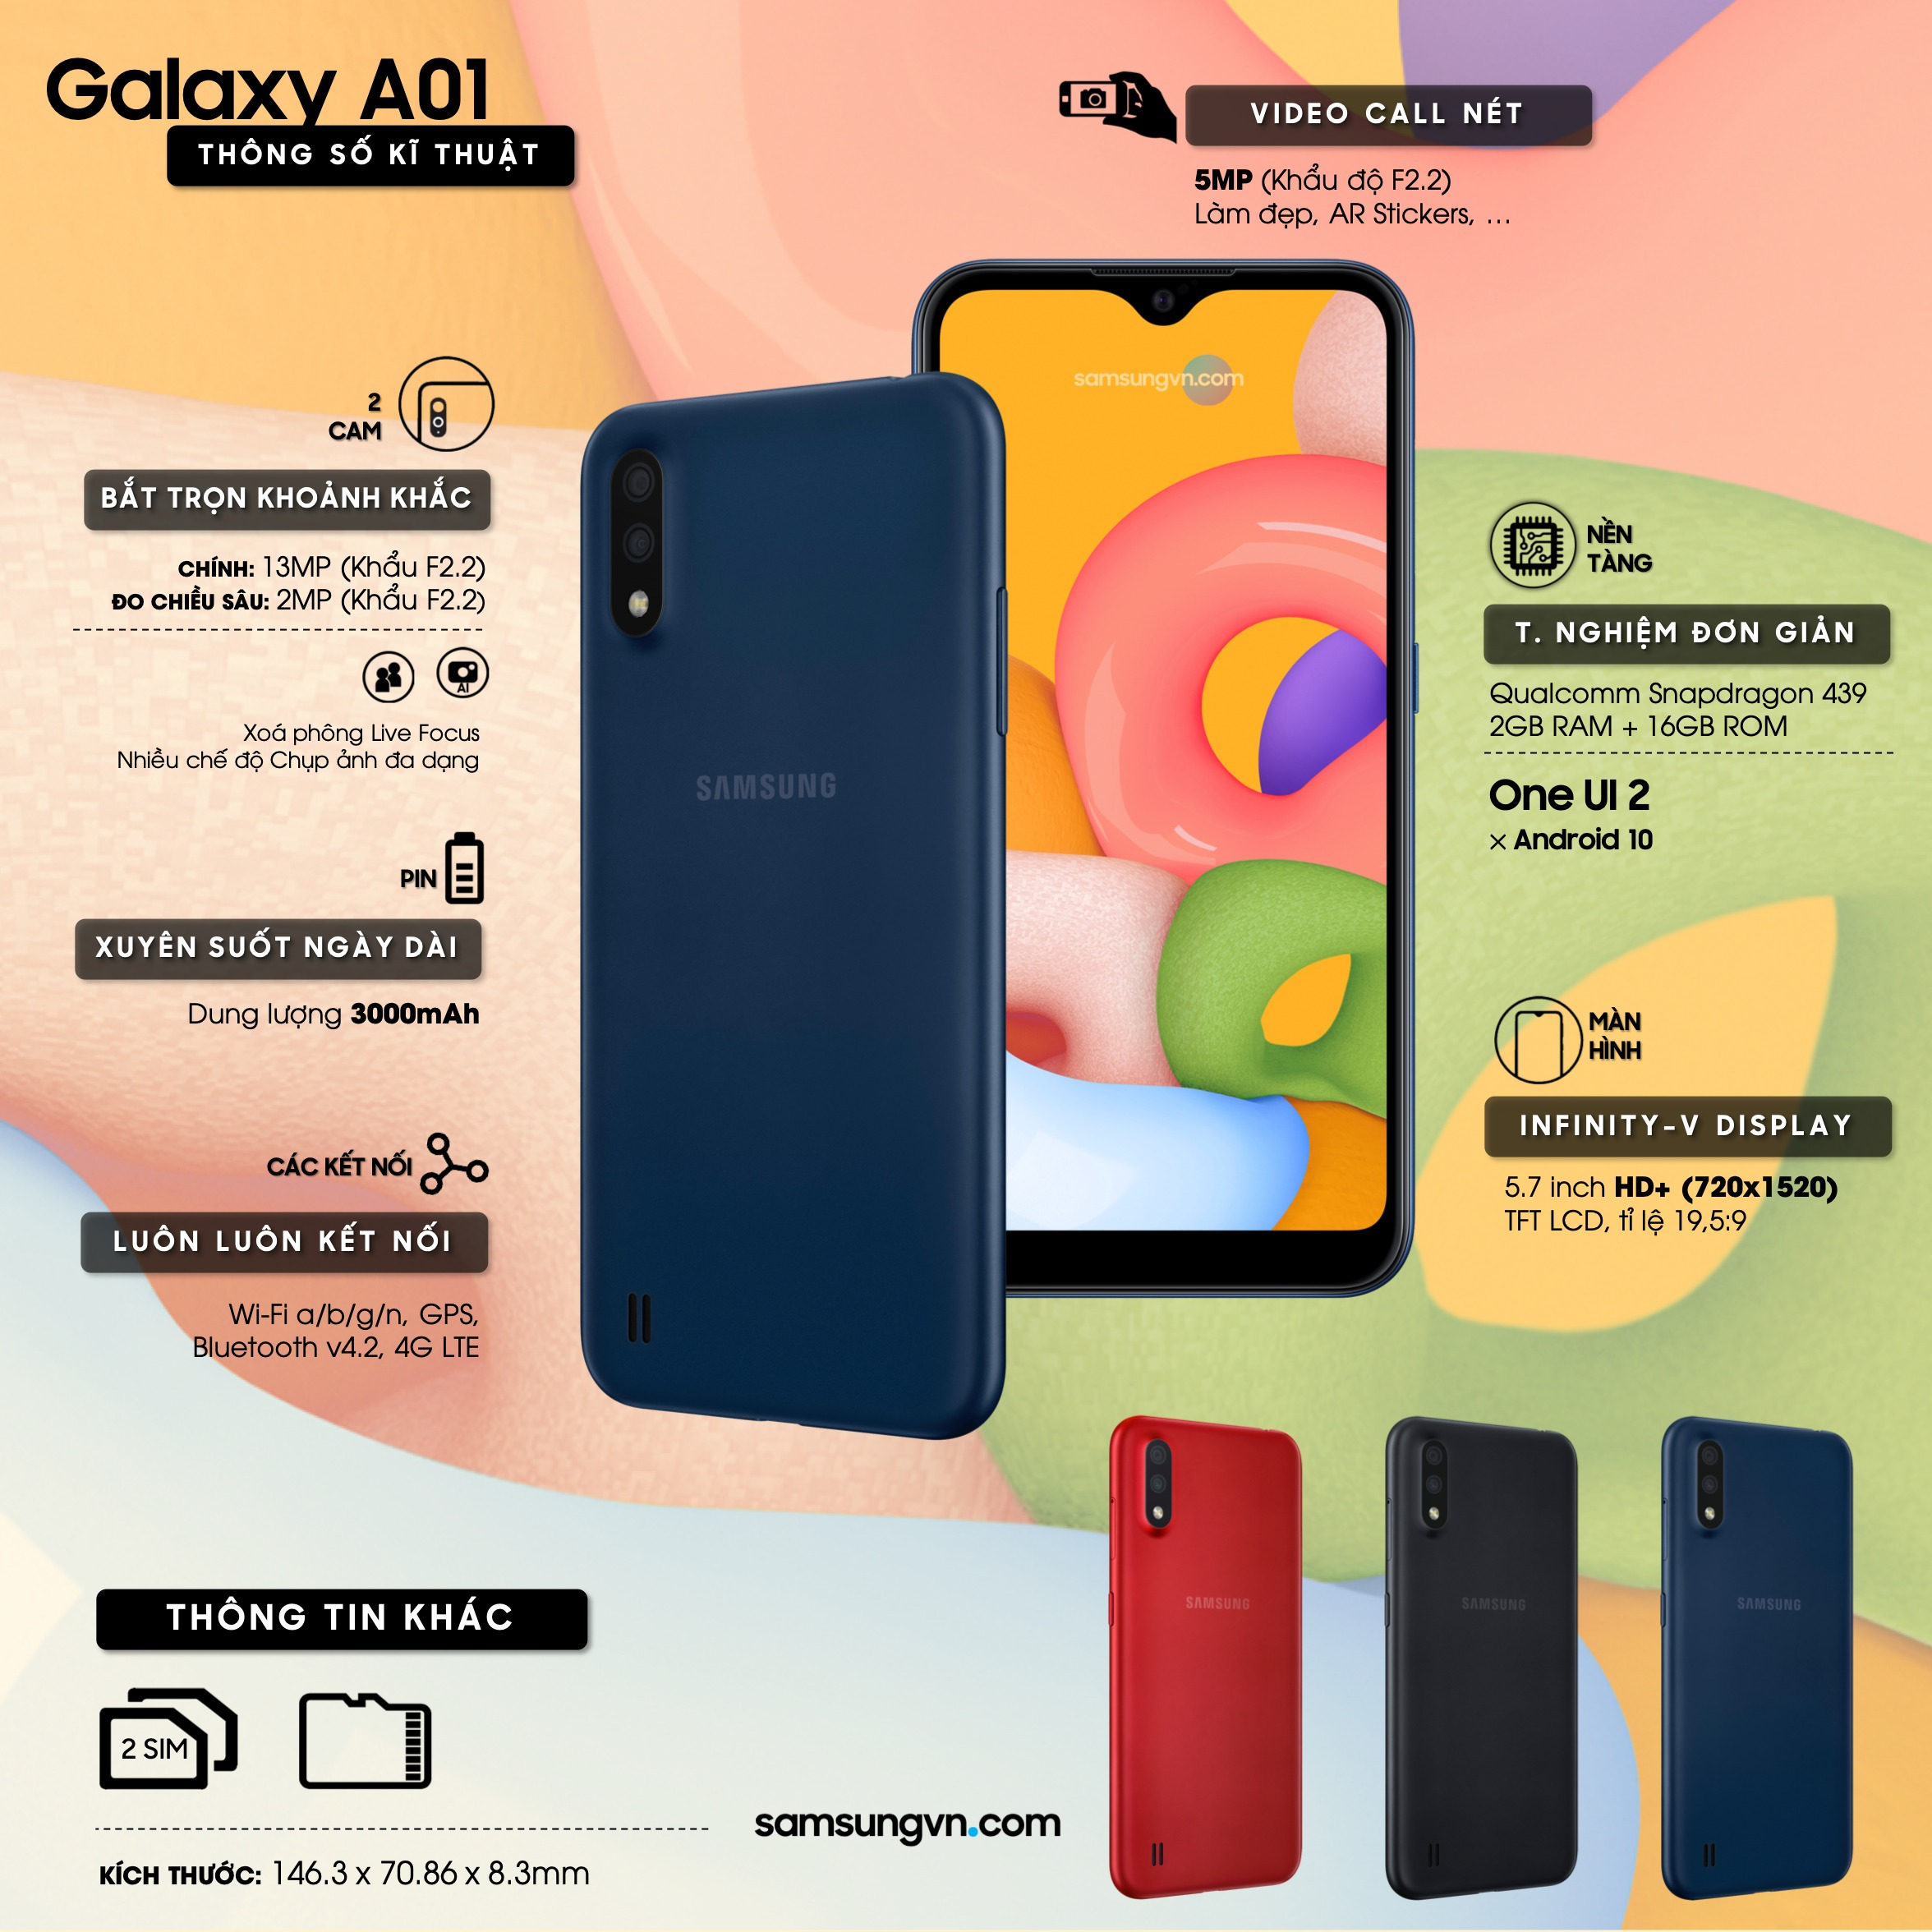 Thông số kỹ thuật Samsung Galaxy A01